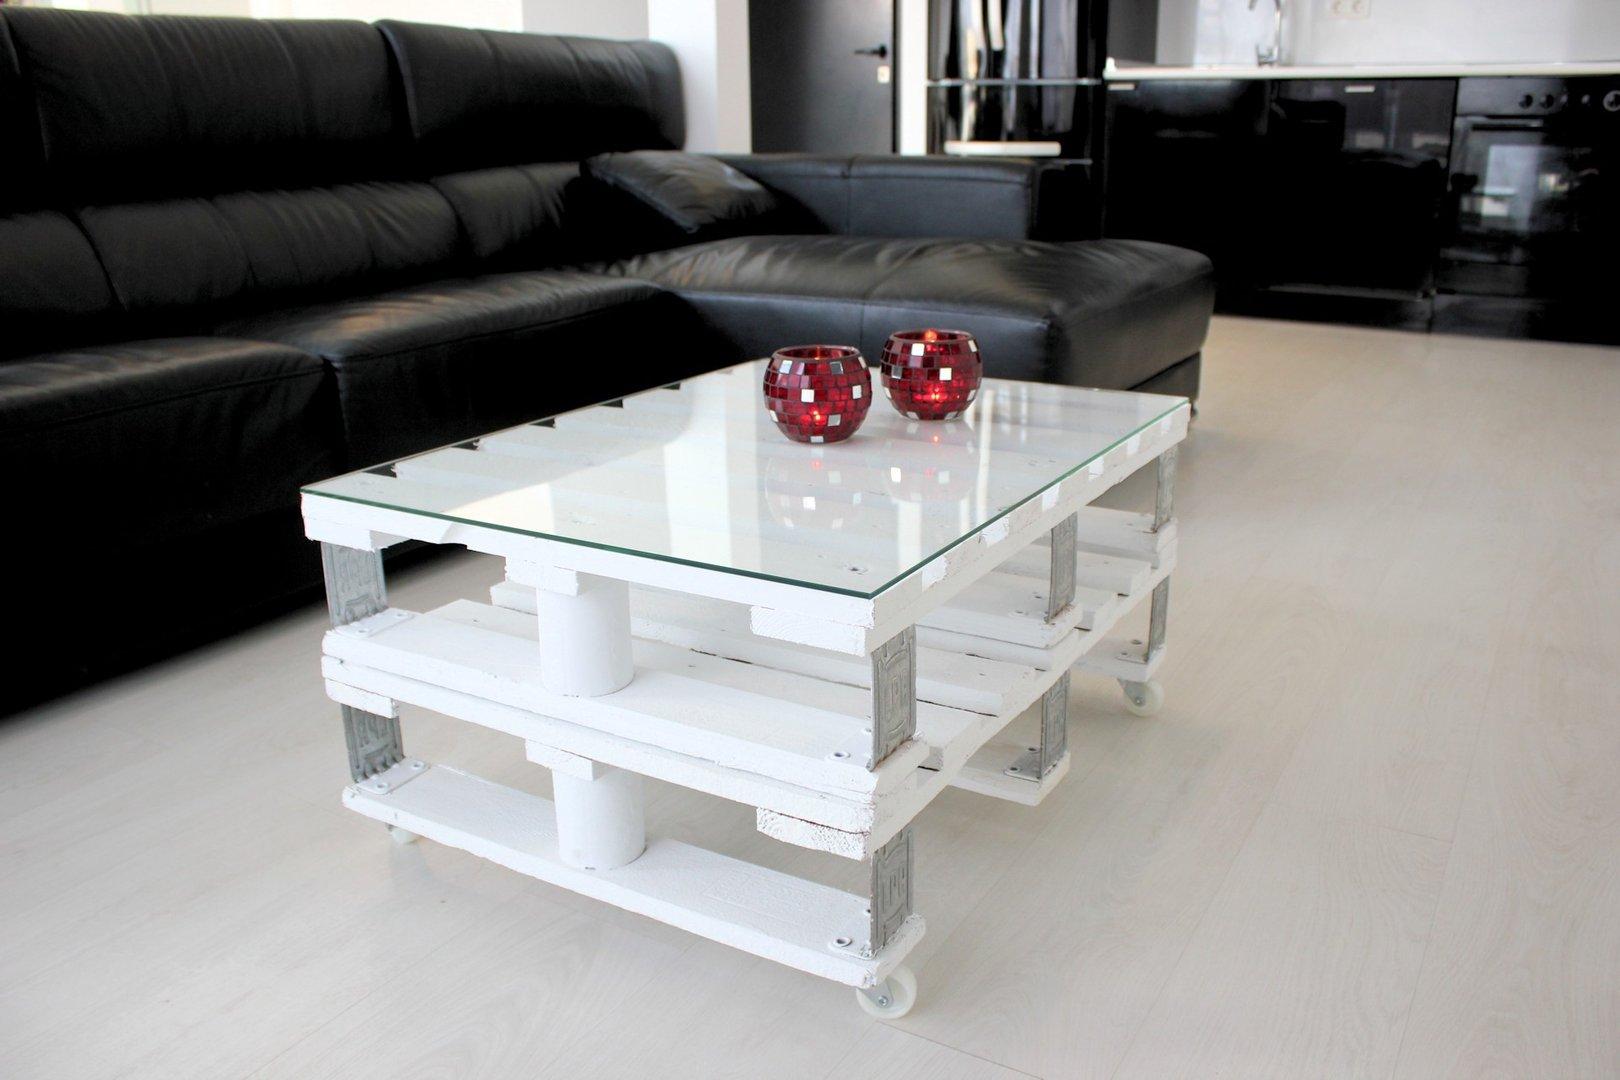 Comprar muebles de palets elegant comprar muebles de - Comprar muebles palets ...